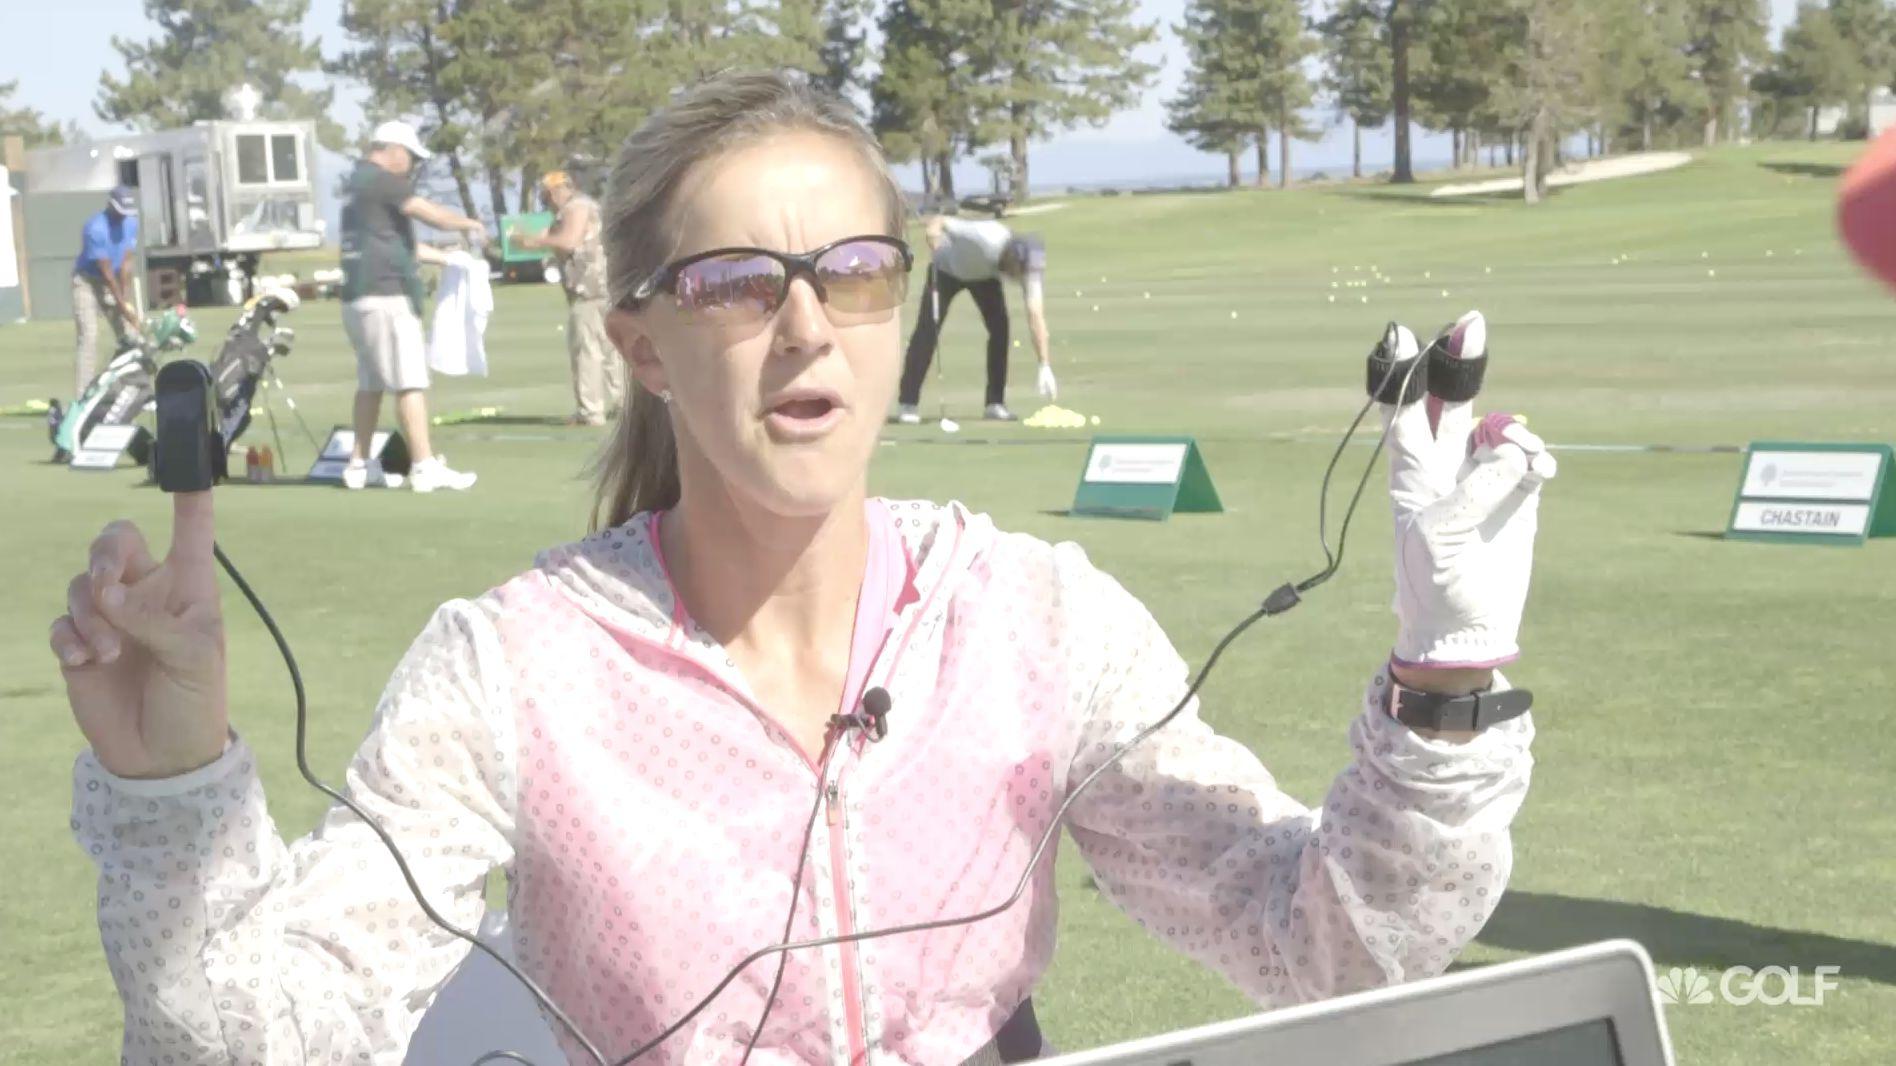 https://golfchannel-a.akamaihd.net/ramp/579/975/acc-lie-detector-brandi-chastain.jpg